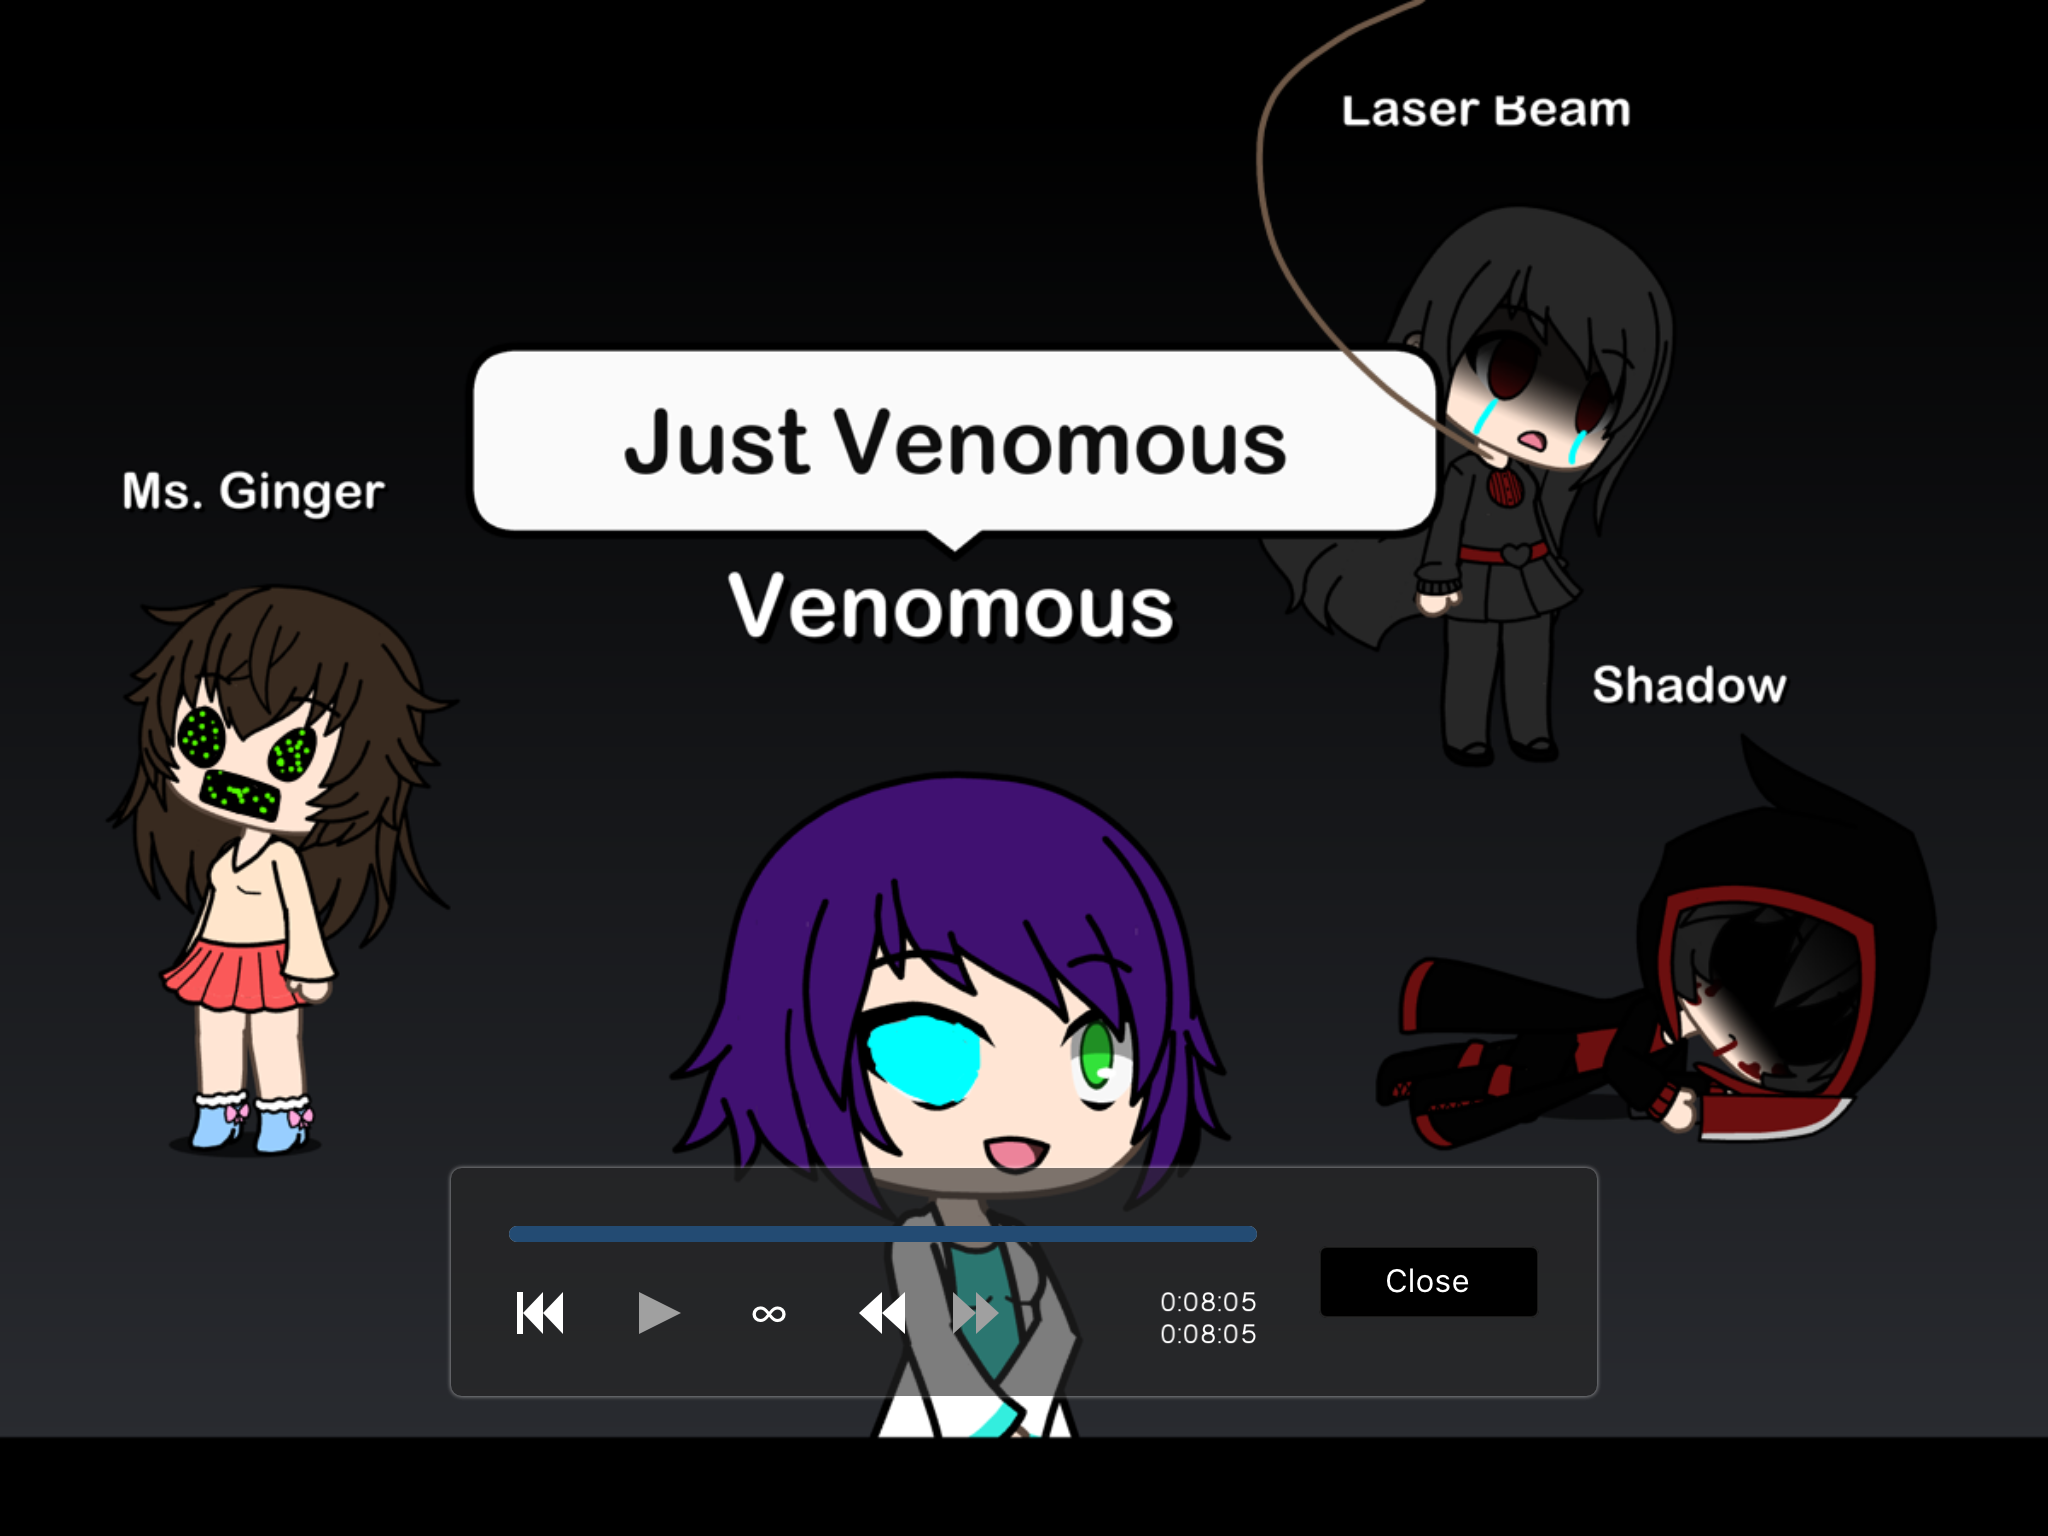 Just Venomous